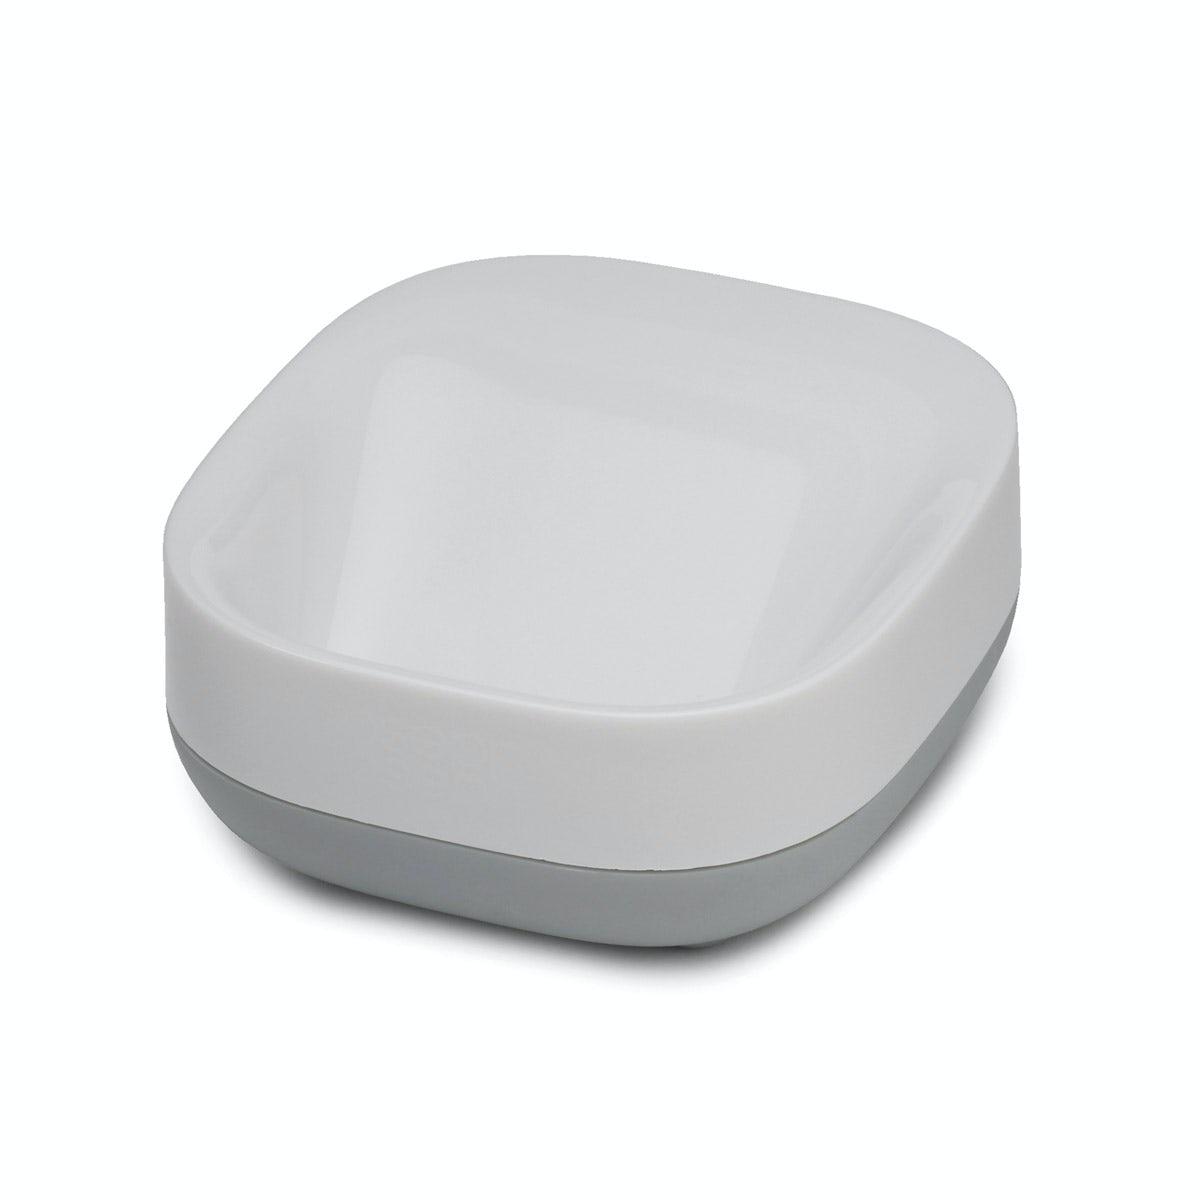 Joseph Joseph Slim grey compact soap dish